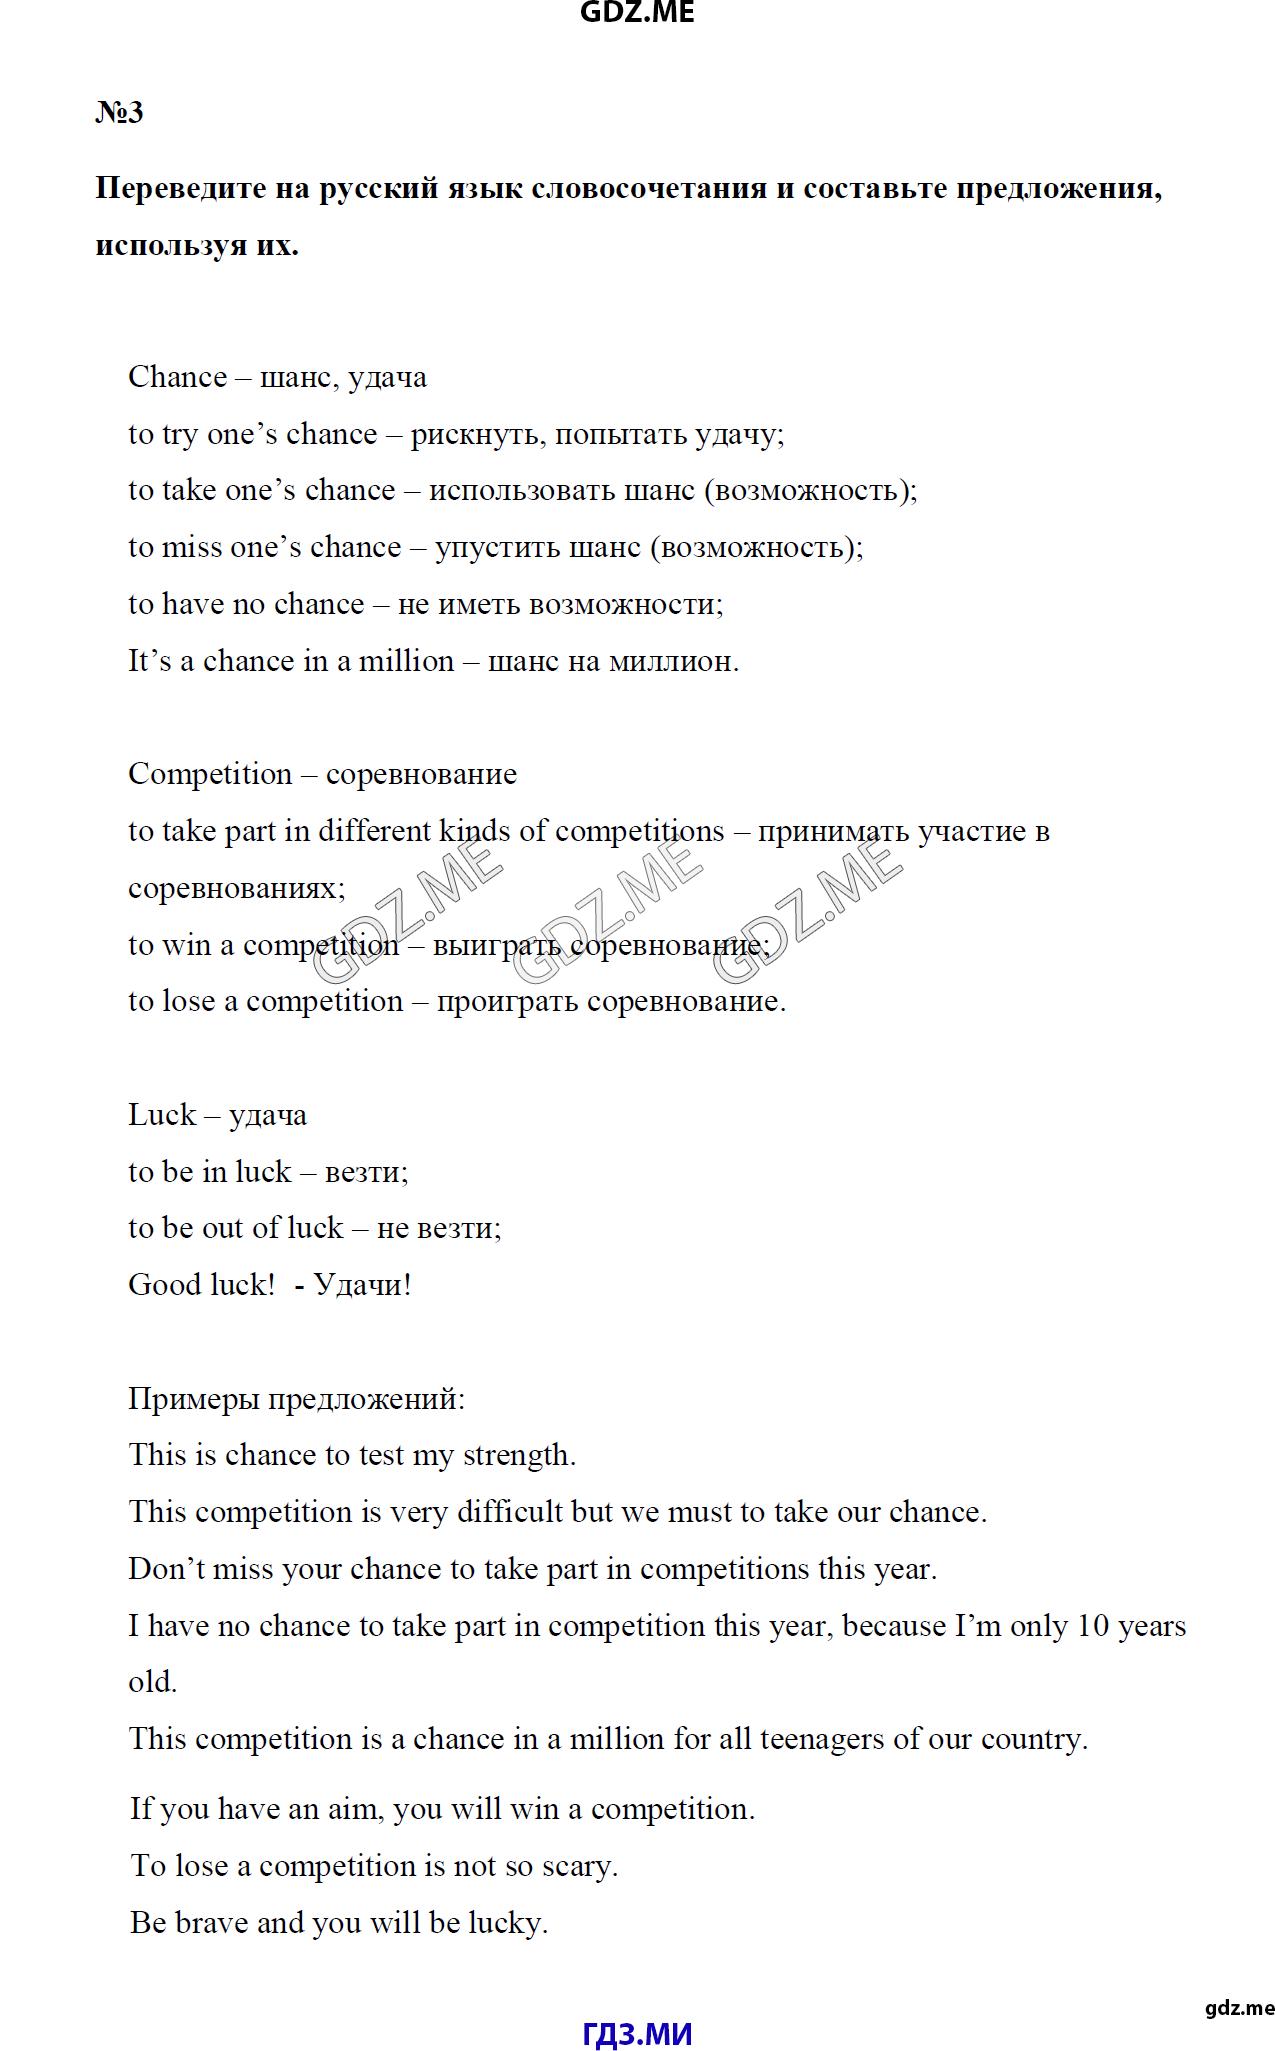 Онлайн решебник по английскому 10 класс биболетова section 2 ex 31 p